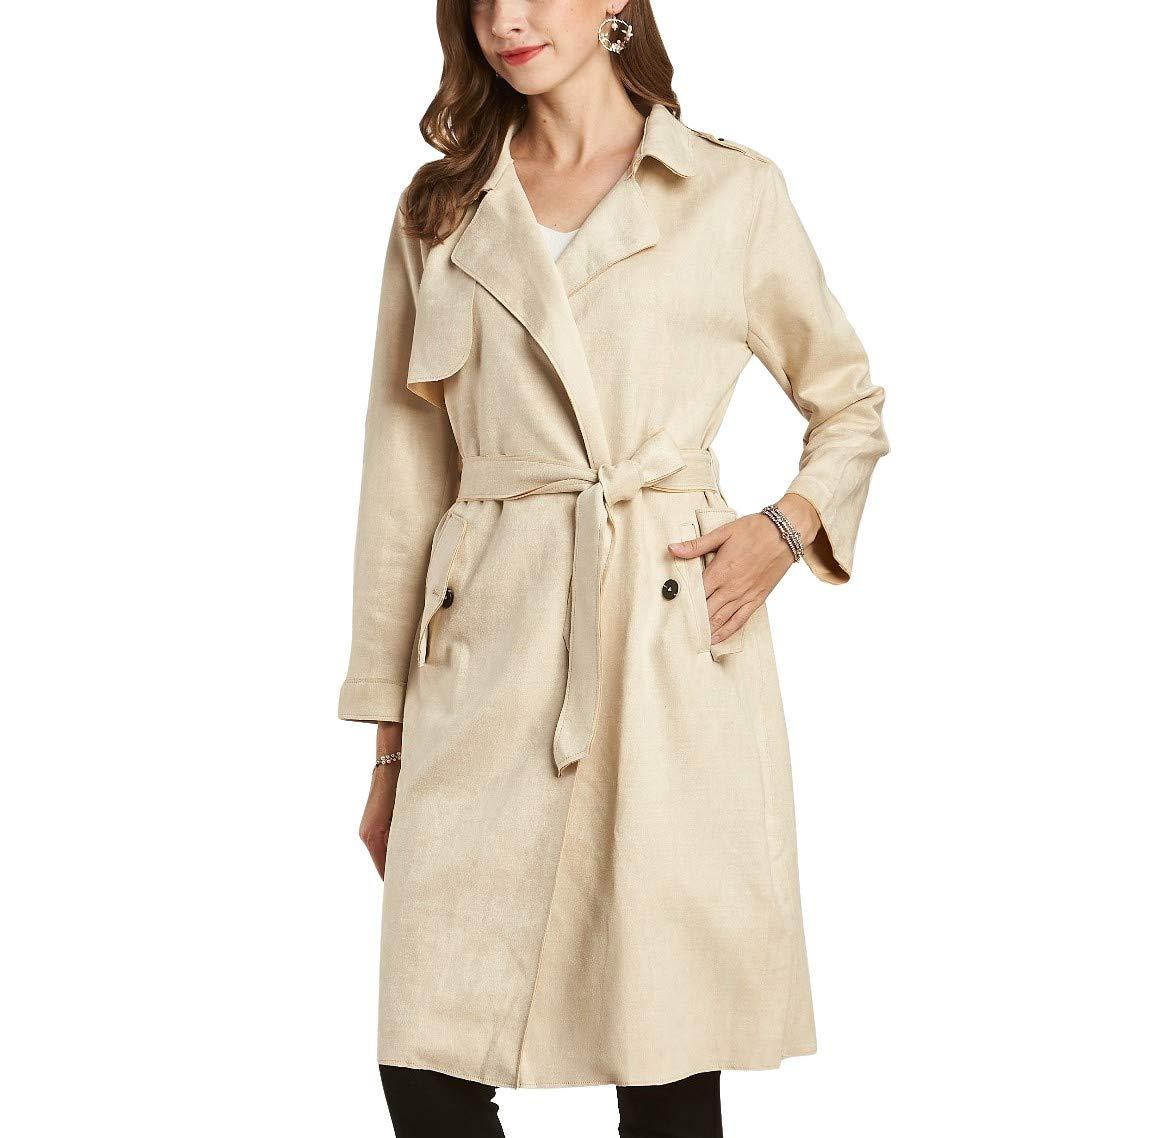 NOBLEMOON Women's Lapel Trench Coat Longline Raincoat Pea Coat with Belt